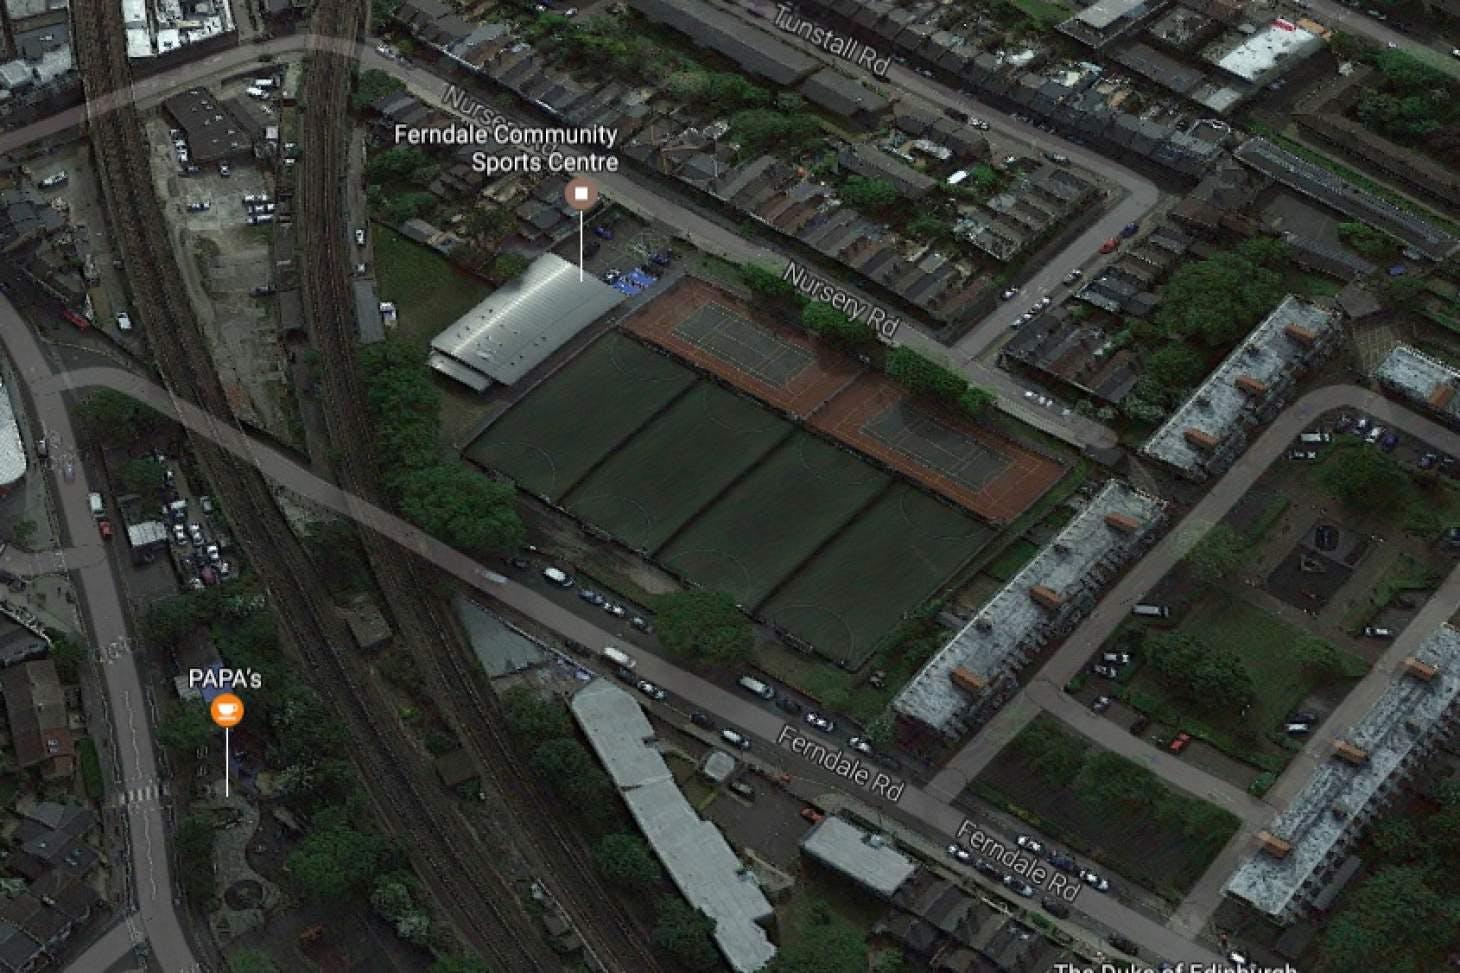 Brixton - Netbusters Outdoor | Hard (macadam) netball court